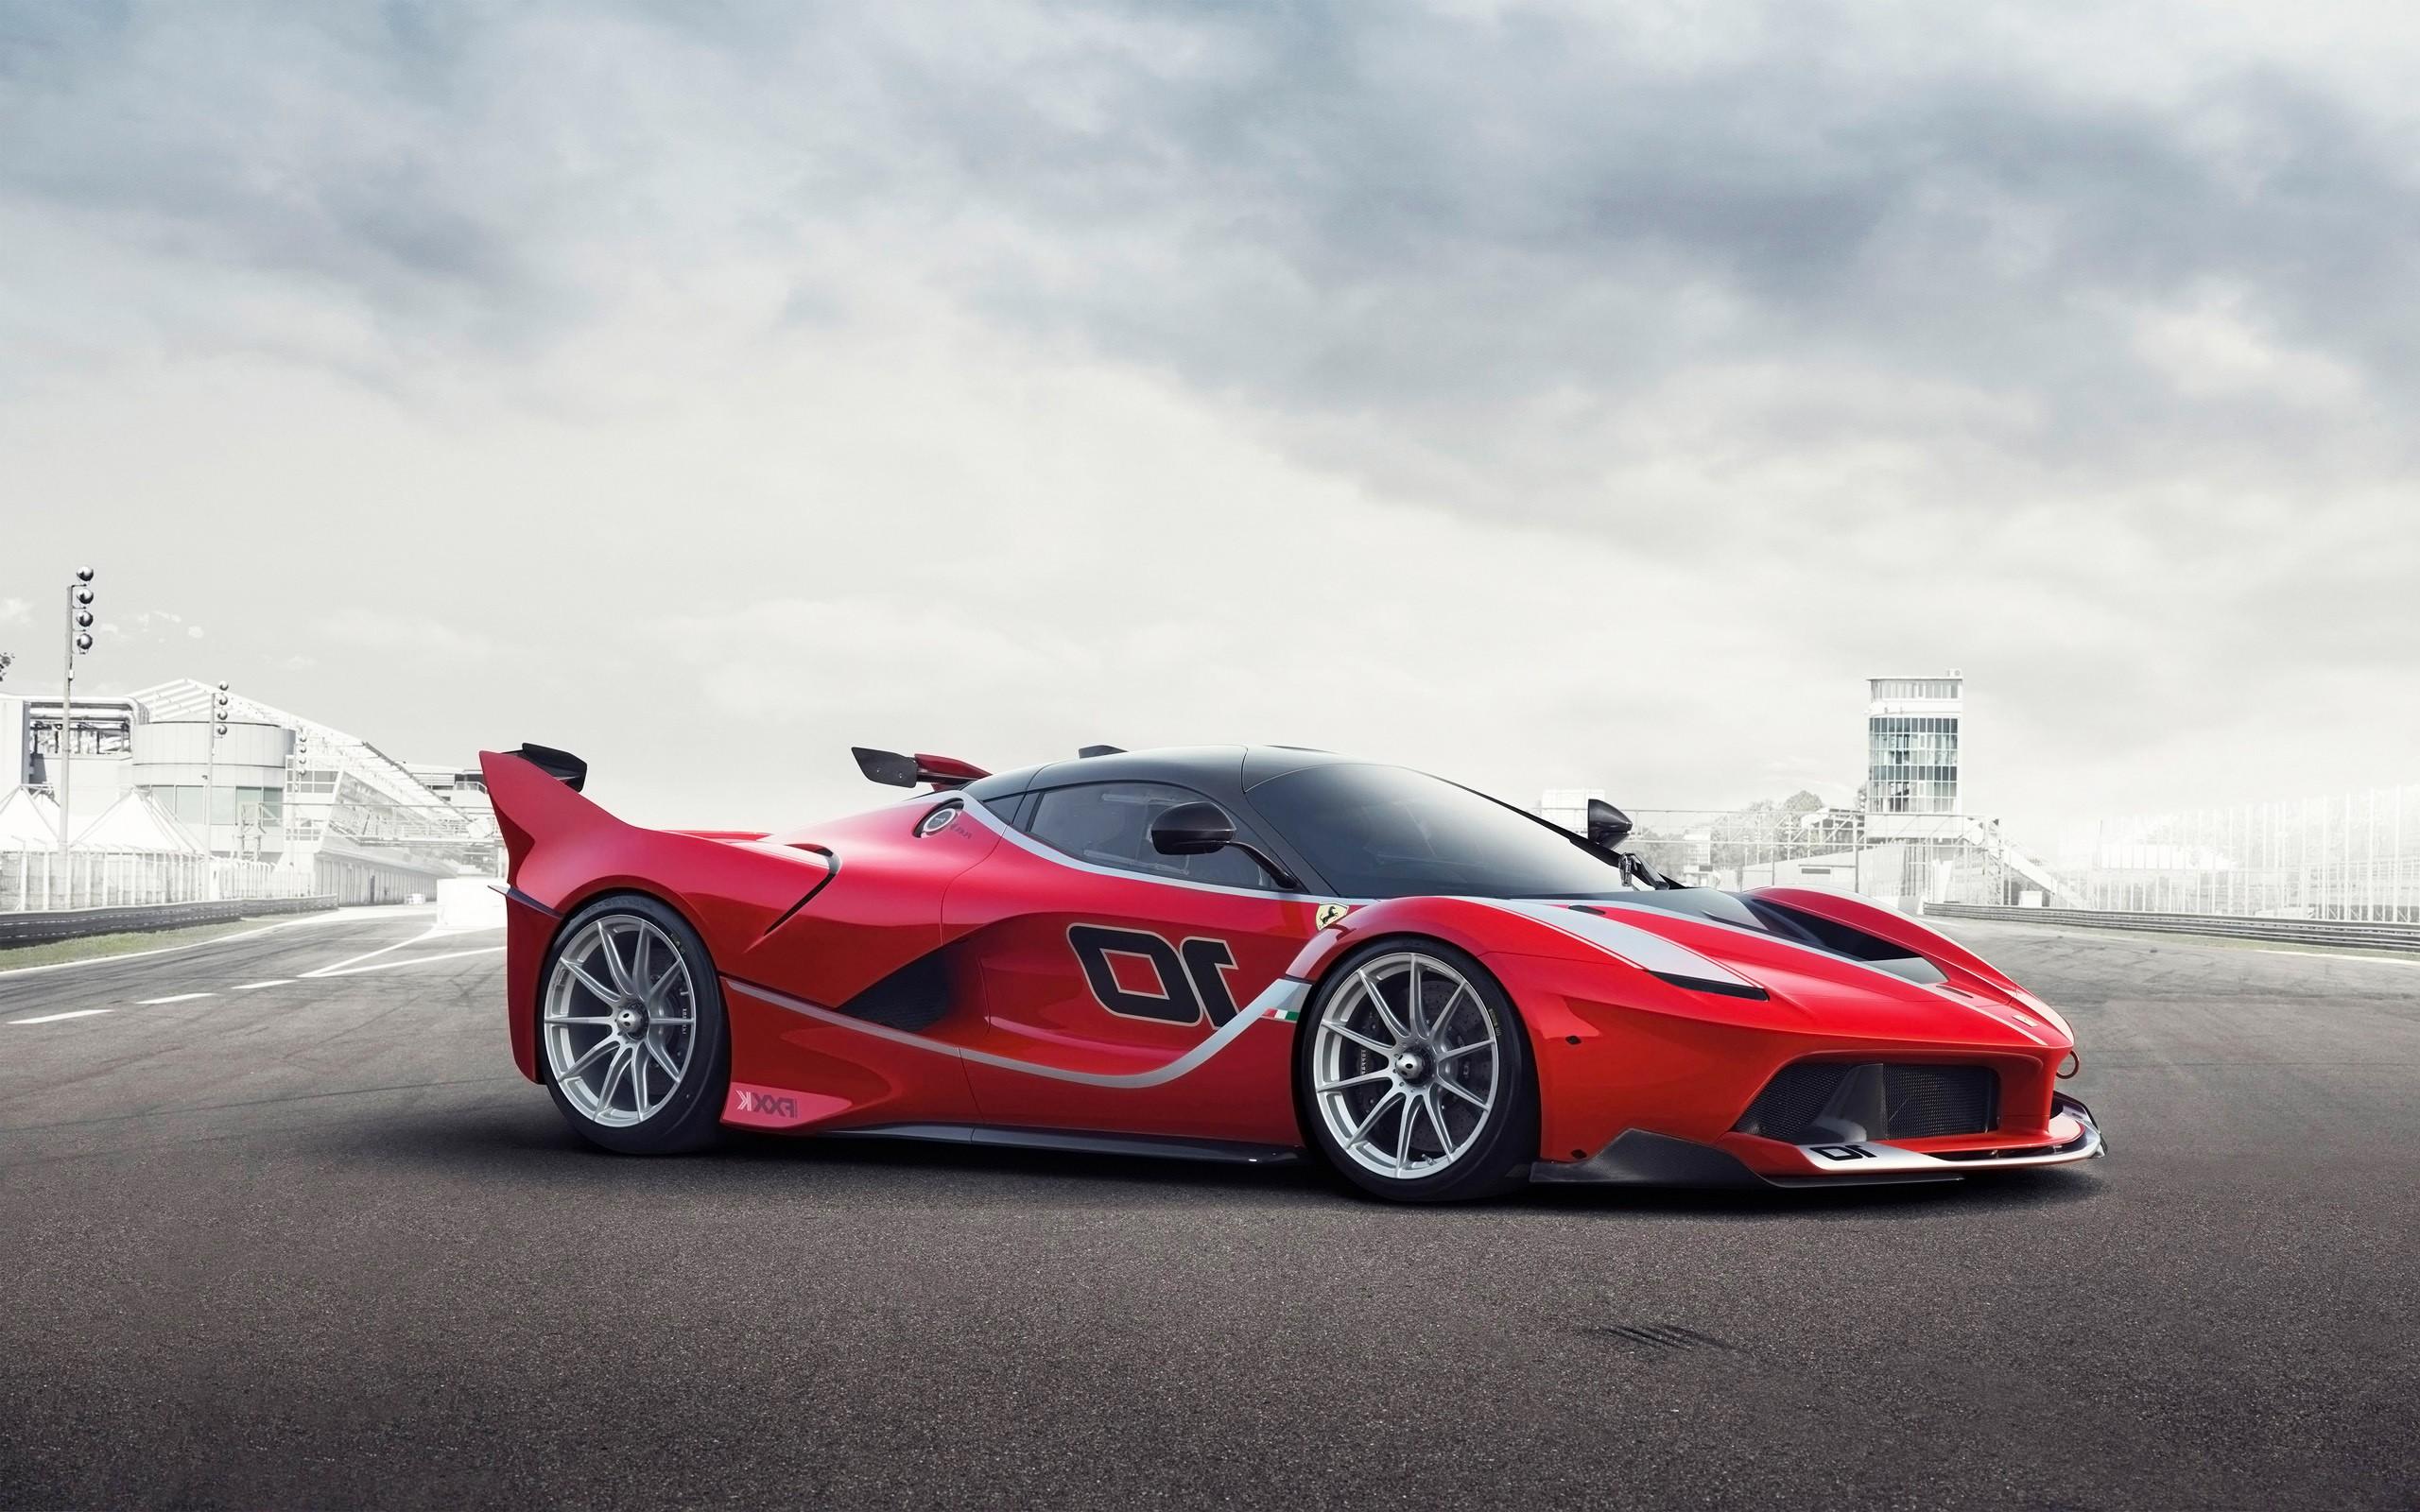 Ferrari Fxx K Hd Cars 4k Wallpapers Images Backgrounds Photos